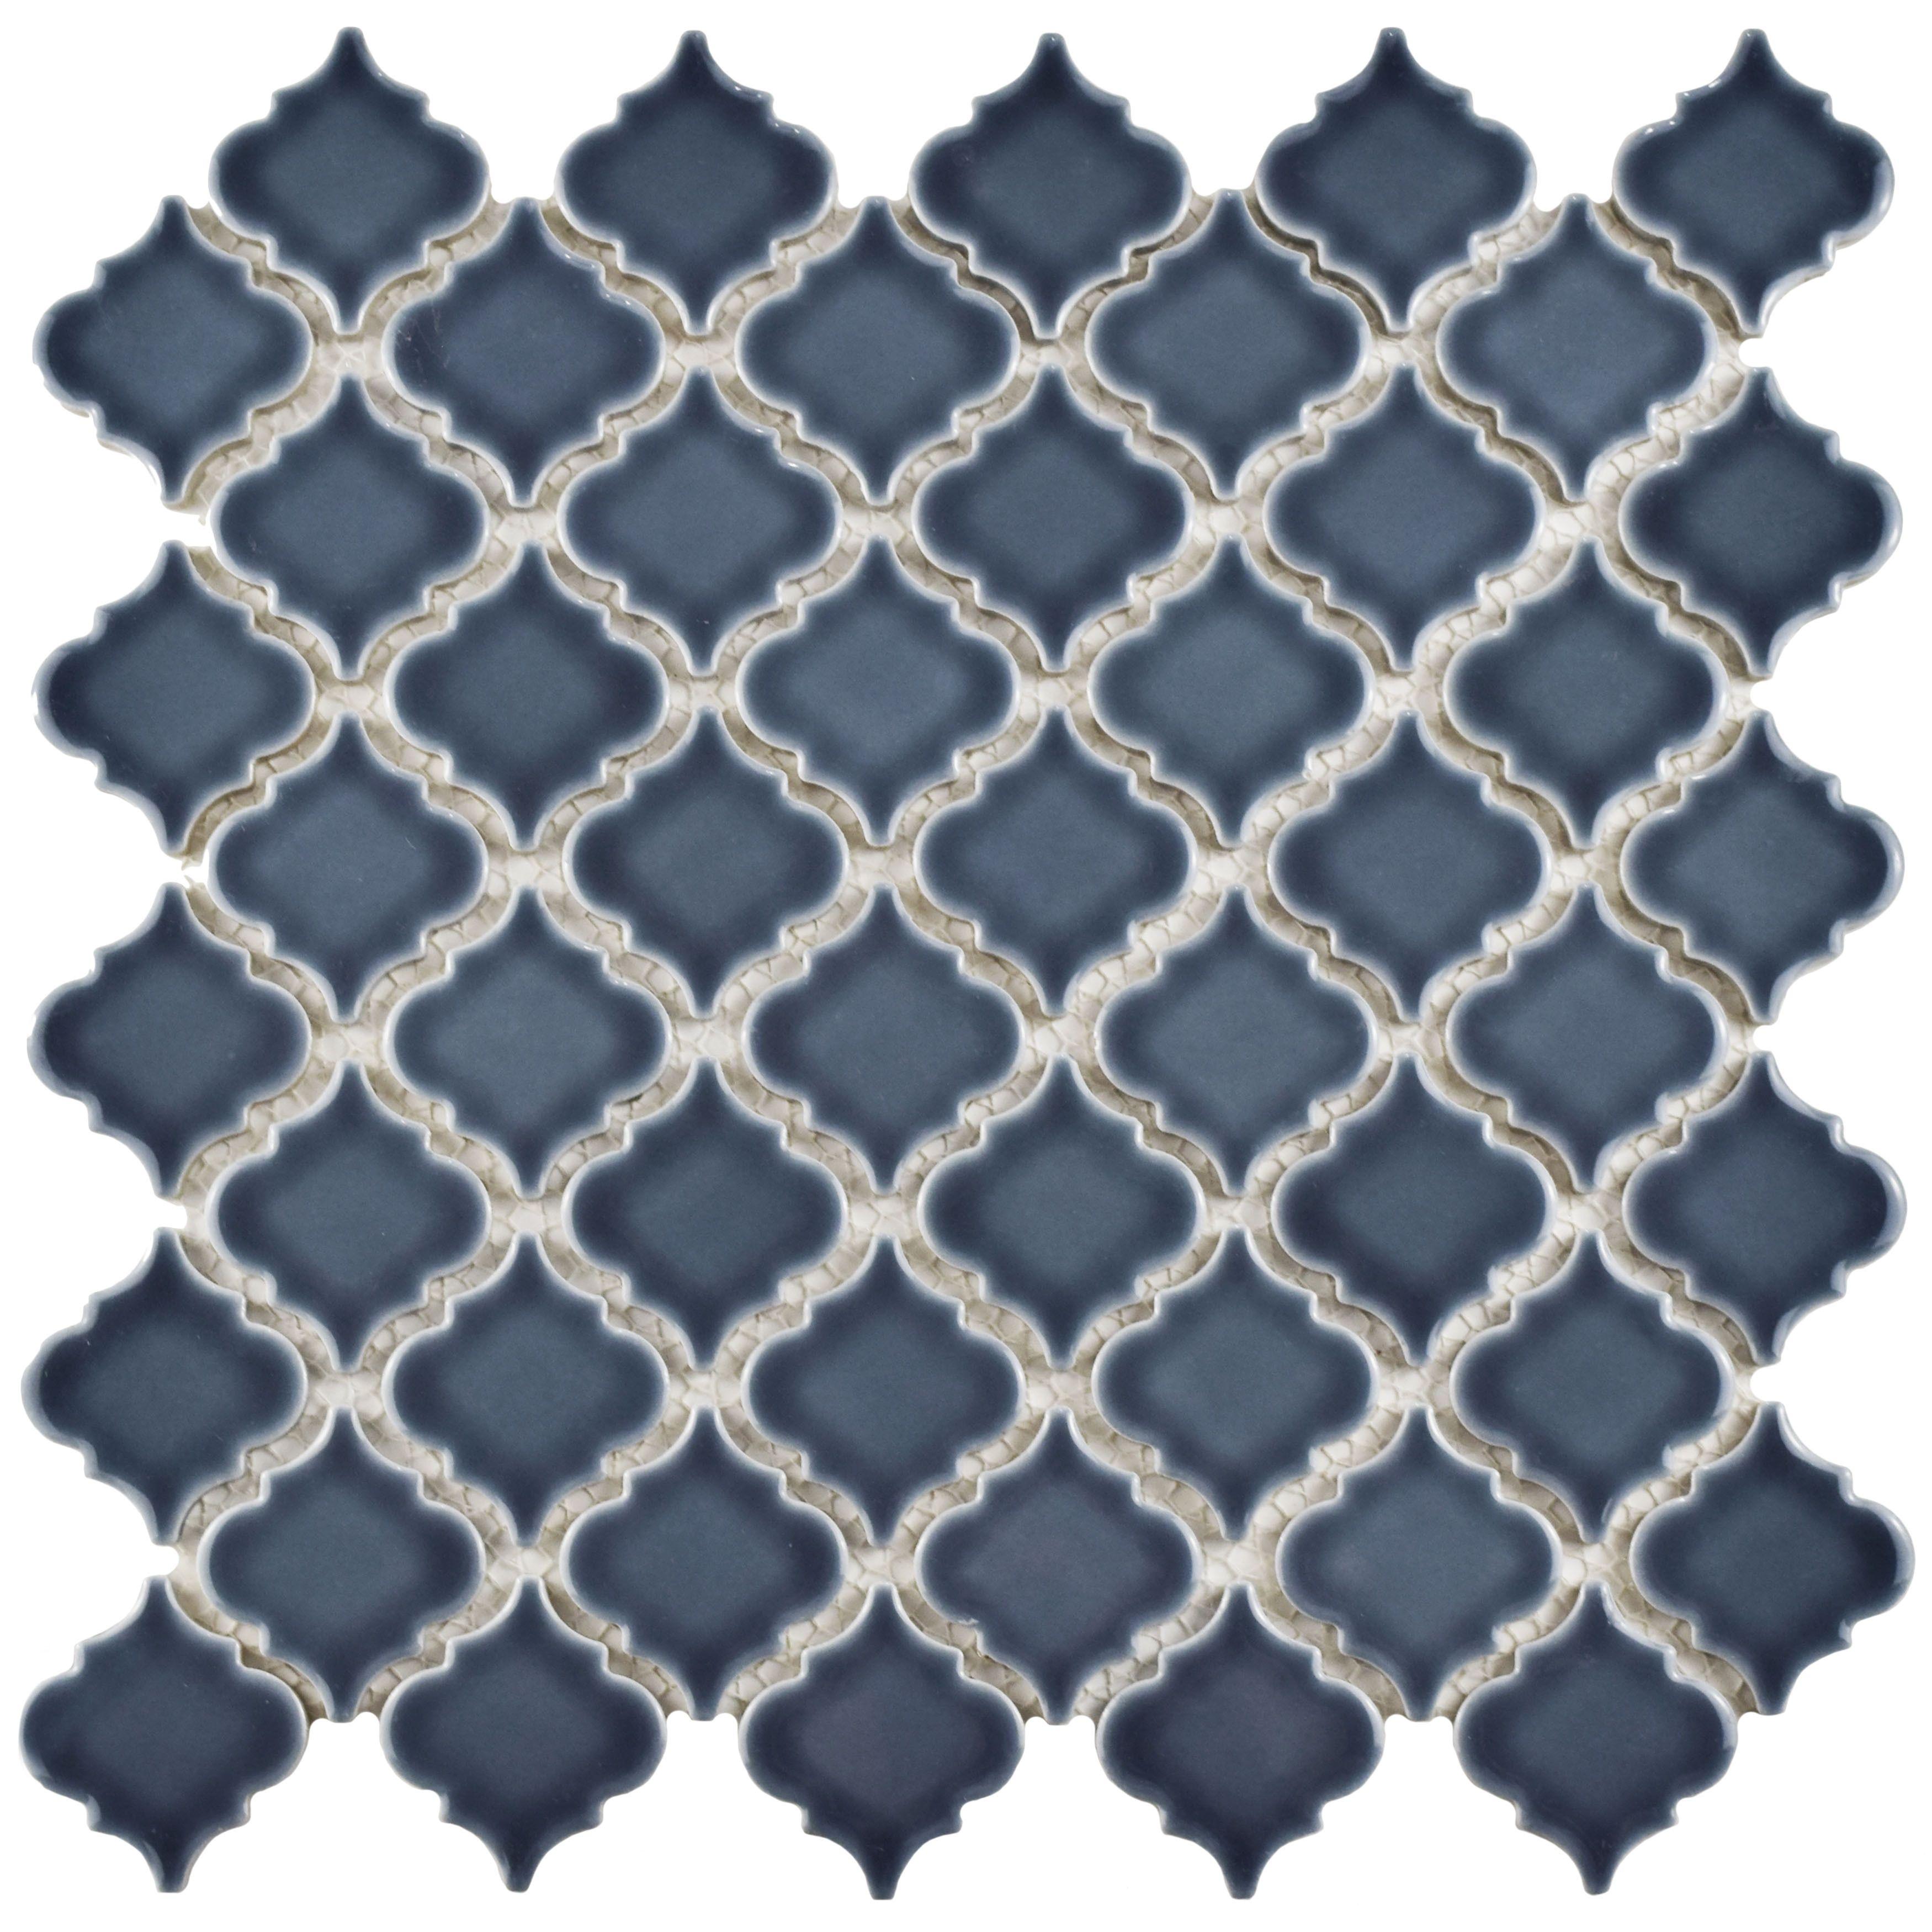 SomerTile Antaeus Storm Grey Lantern-shape Porcelain Mosaic Floor ...